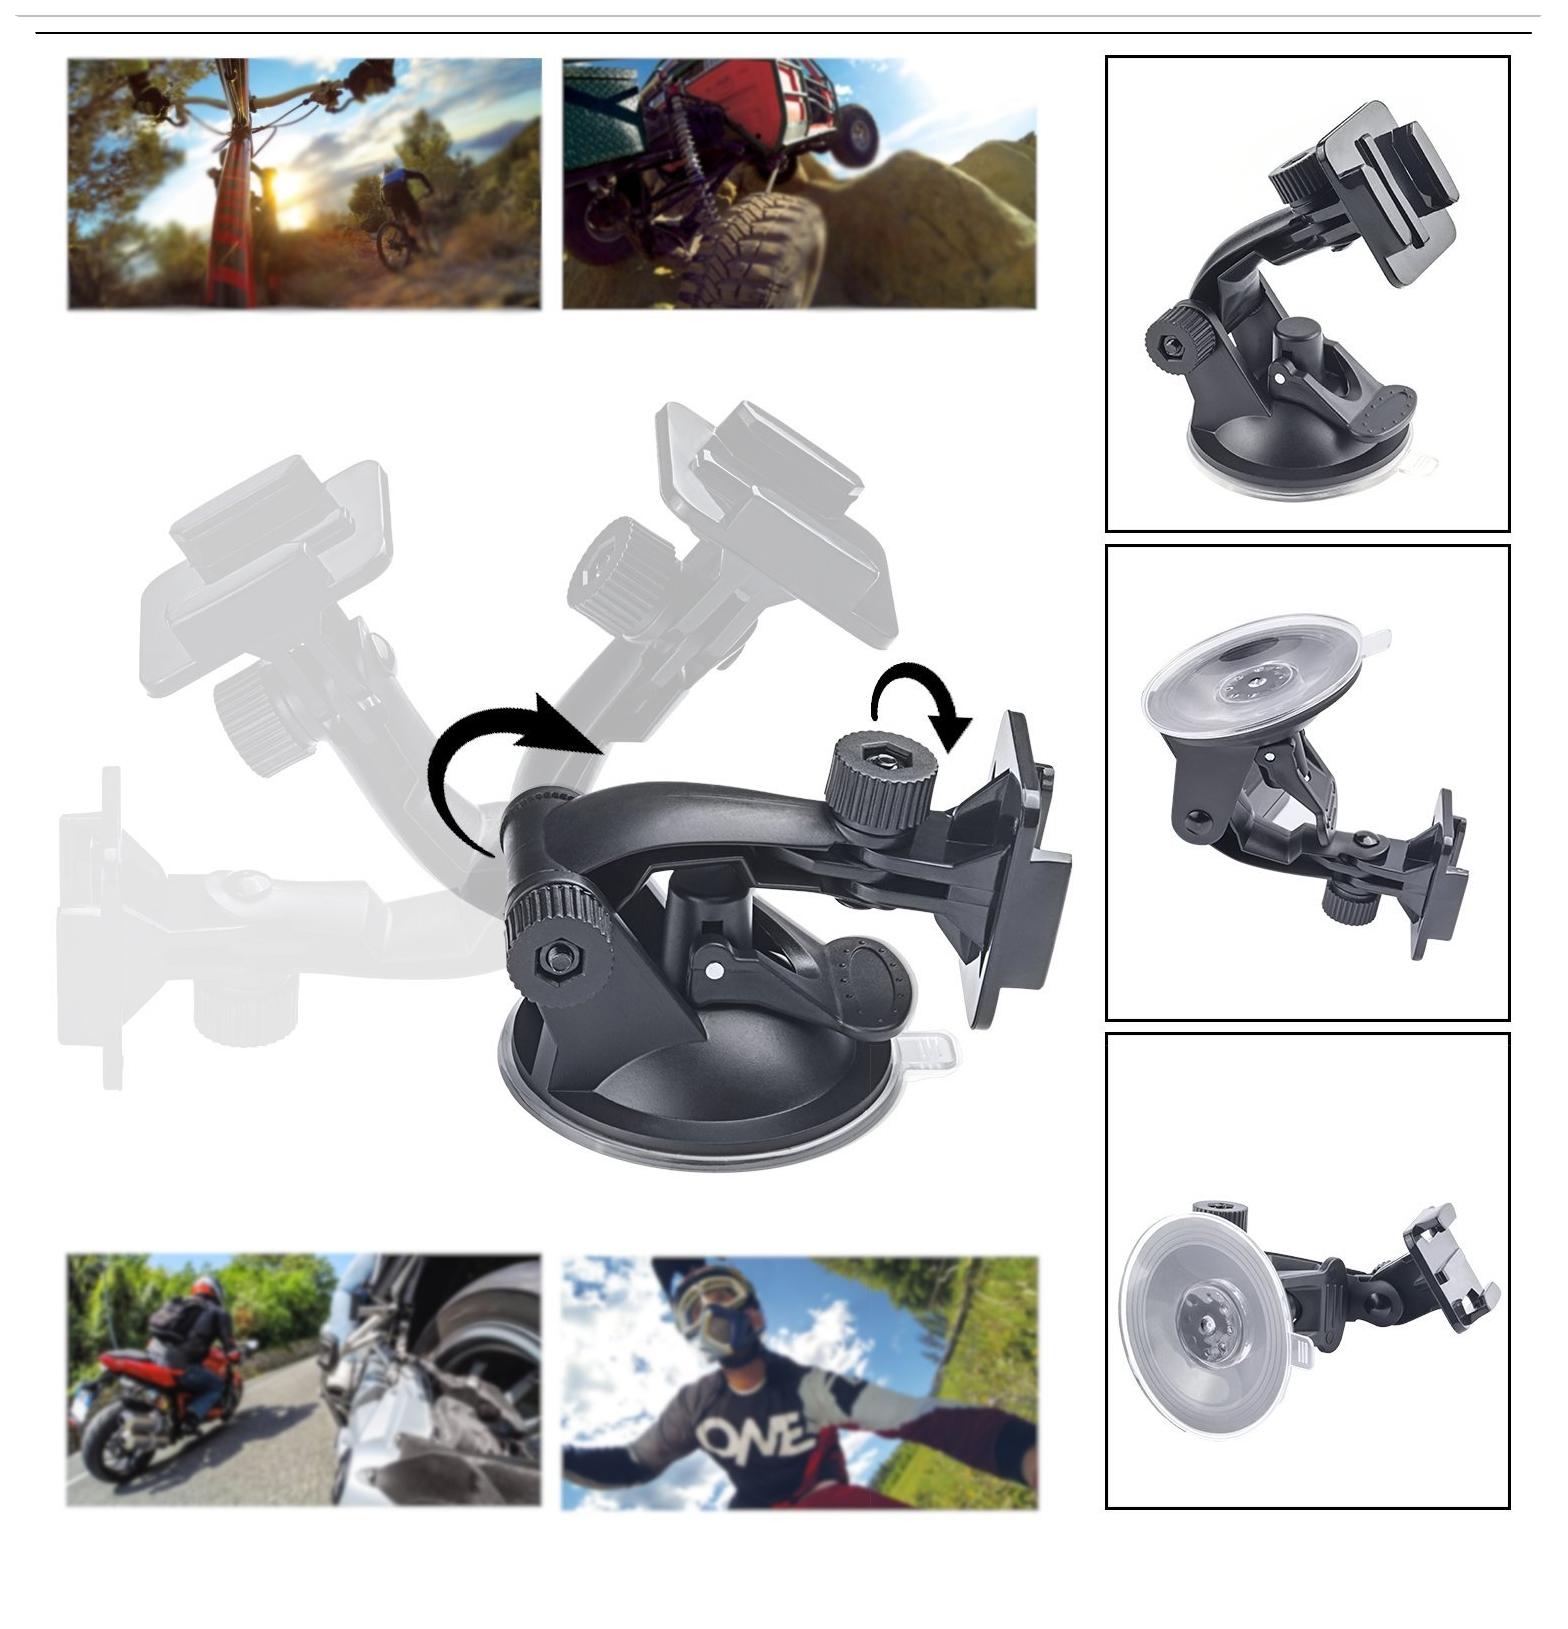 Go pro Accessories Set Three-way mini tripod monopod Flat Mount For Gopro Hero 4 3 SJ4000 SJCAM xiaomi yi action camera GS11